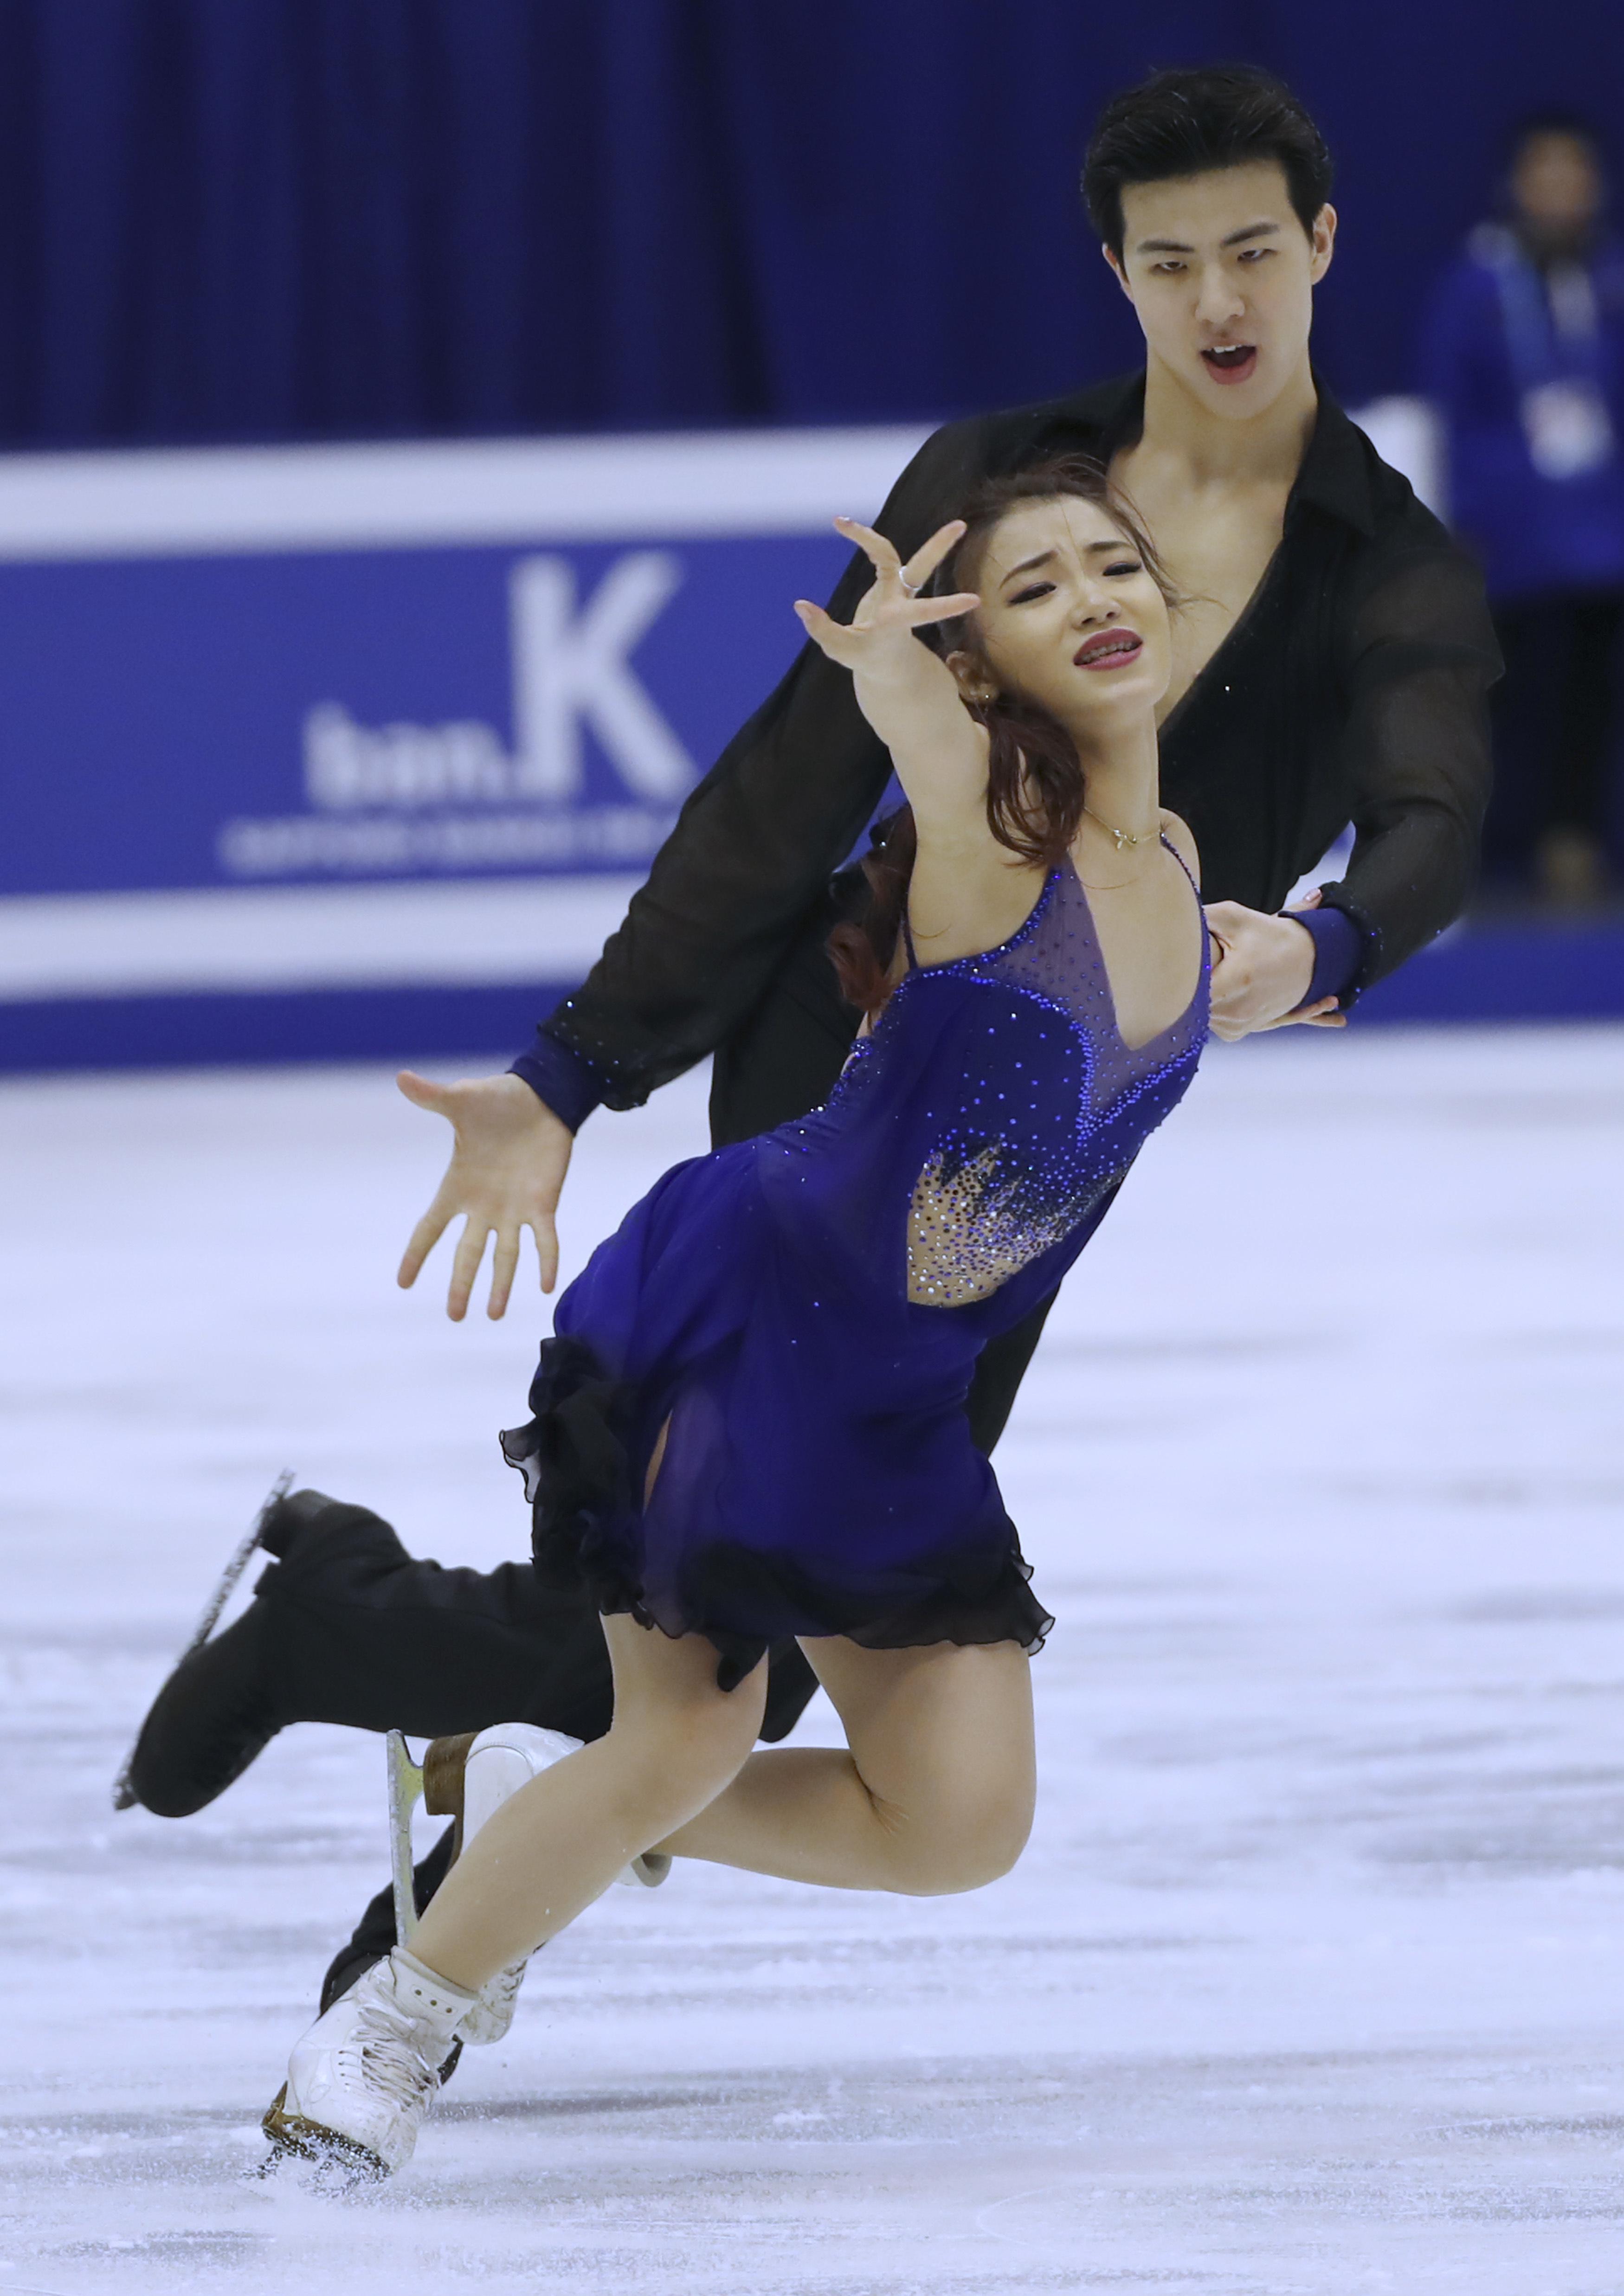 Wang Shiyue and Liu Xinyu of China perform during an Ice Dance Short Distance at Makomanai Indoor Skating Rink at the Asian Winter Games in Sapporo, northern Japan, Thursday, Feb. 23, 2017. (AP Photo/Eugene Hoshiko)